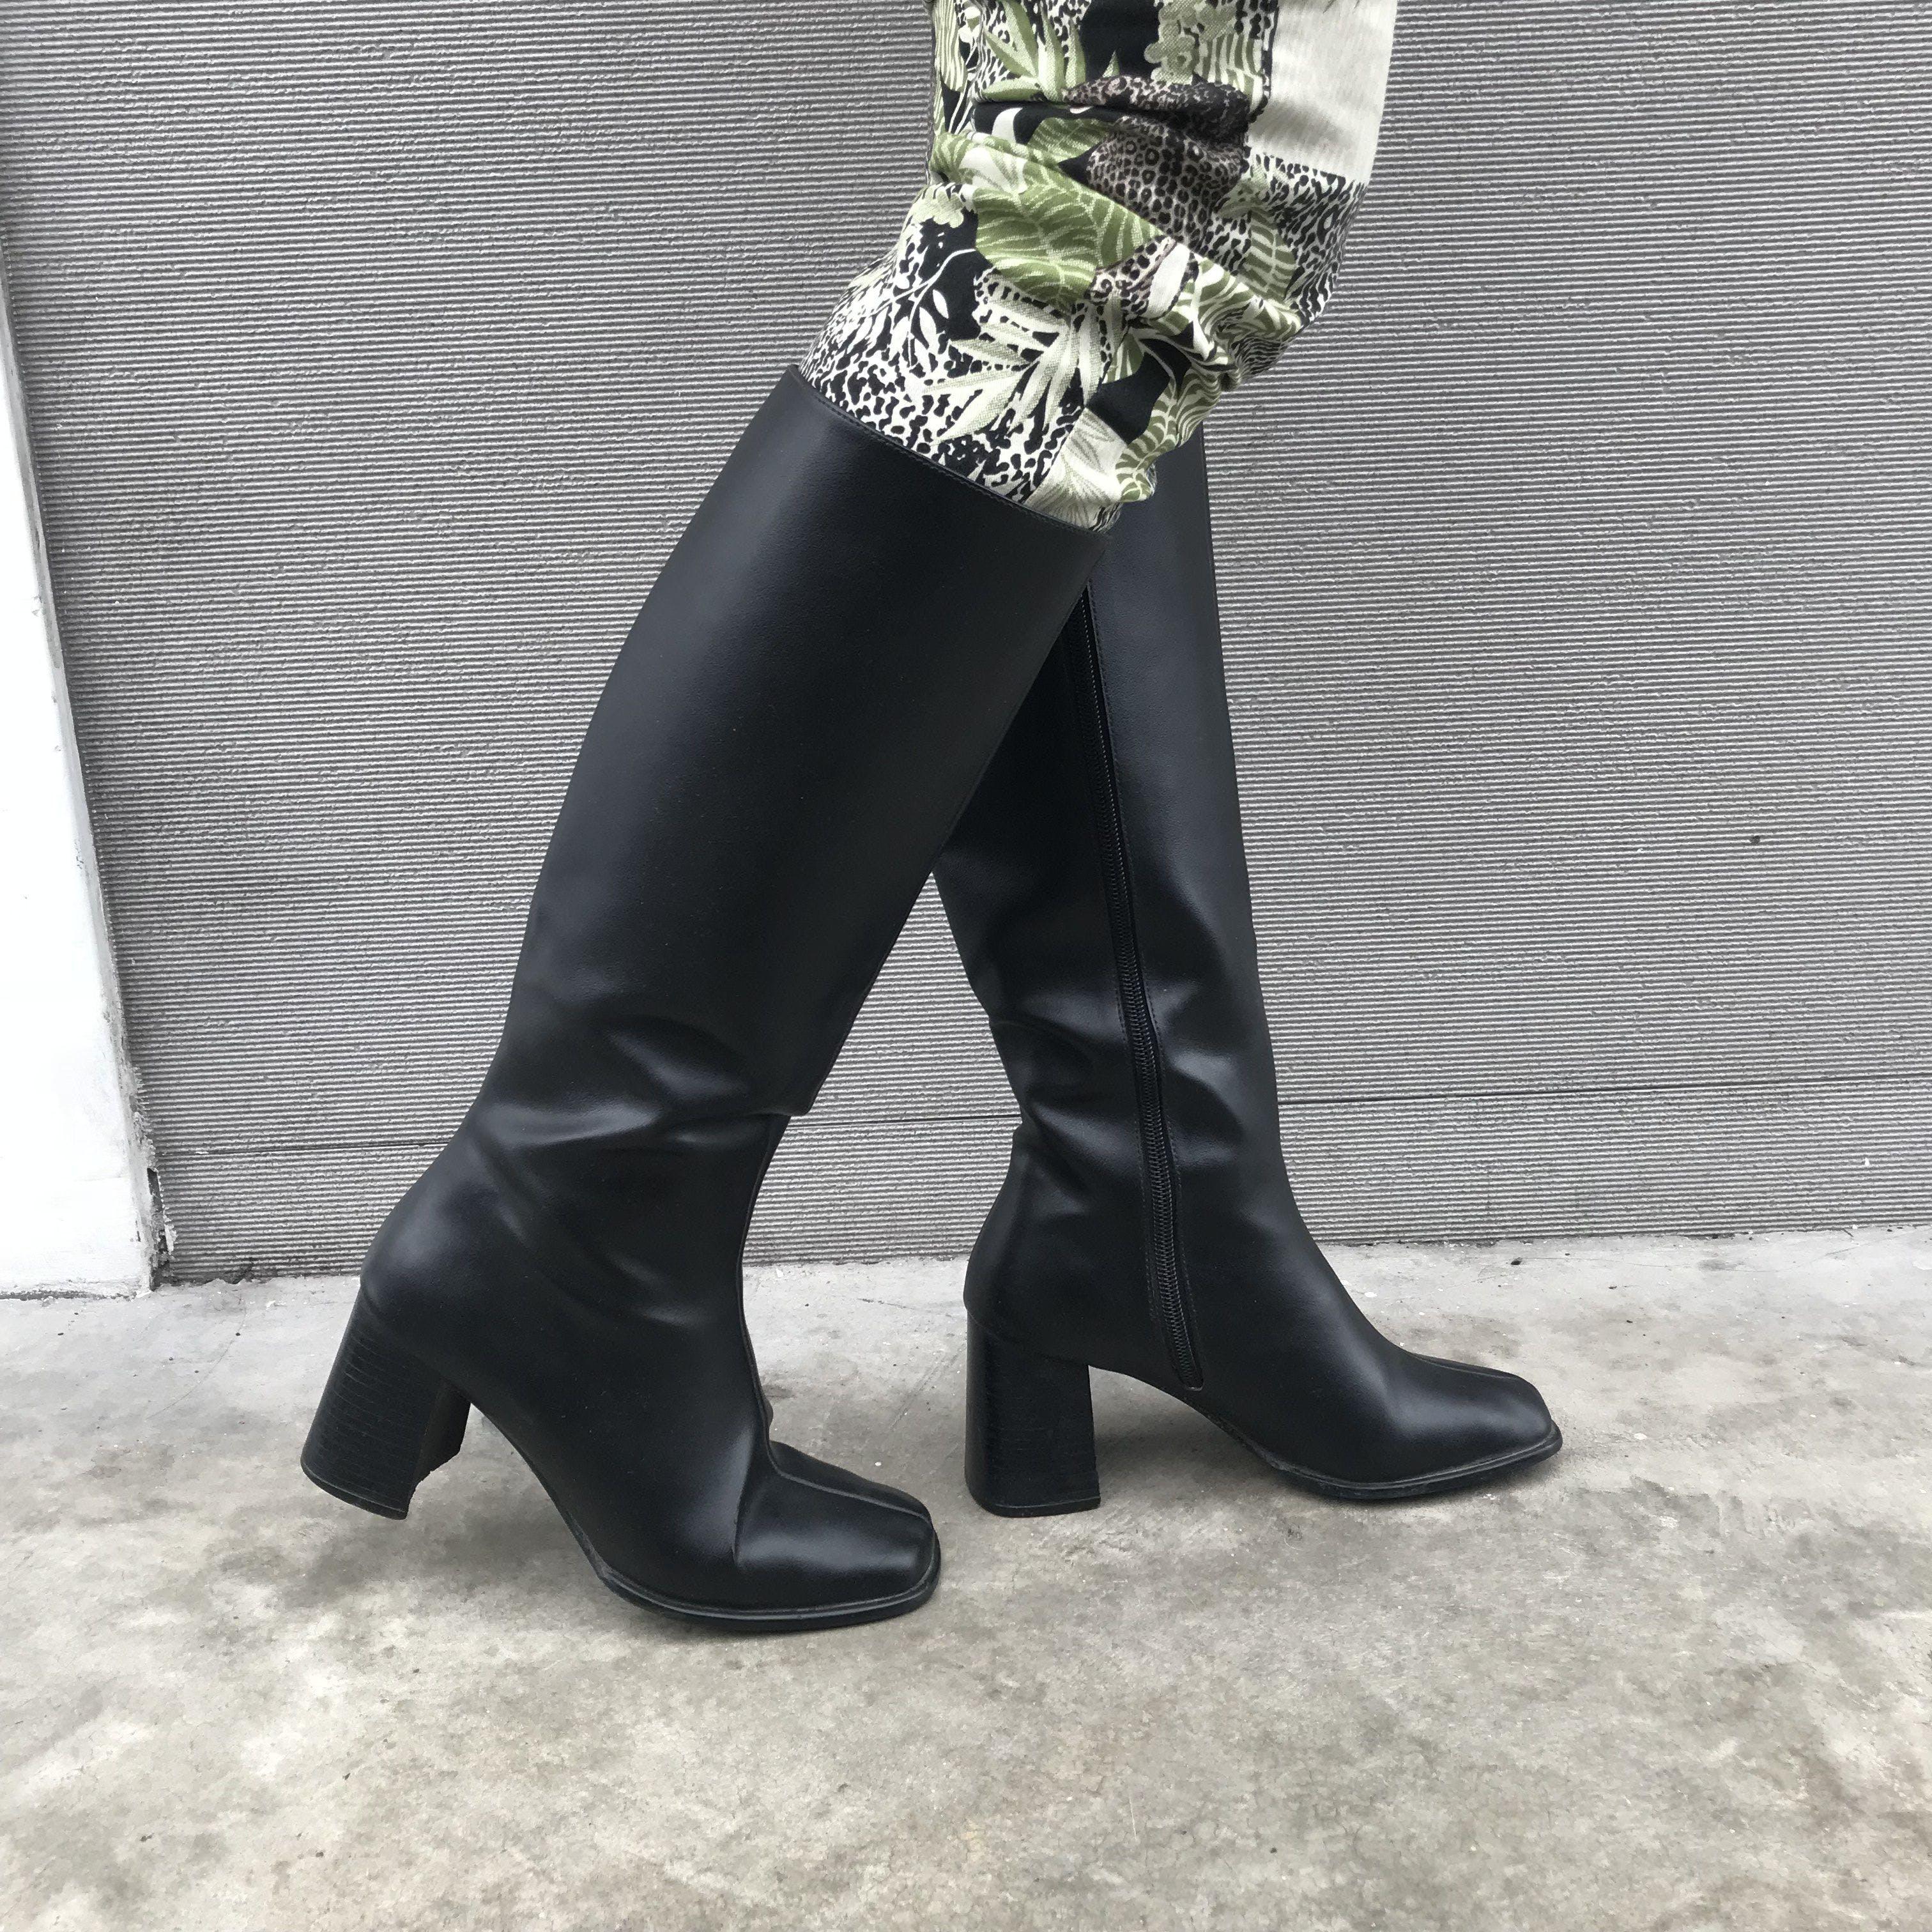 zapatos botas-Marie Claire-imagen